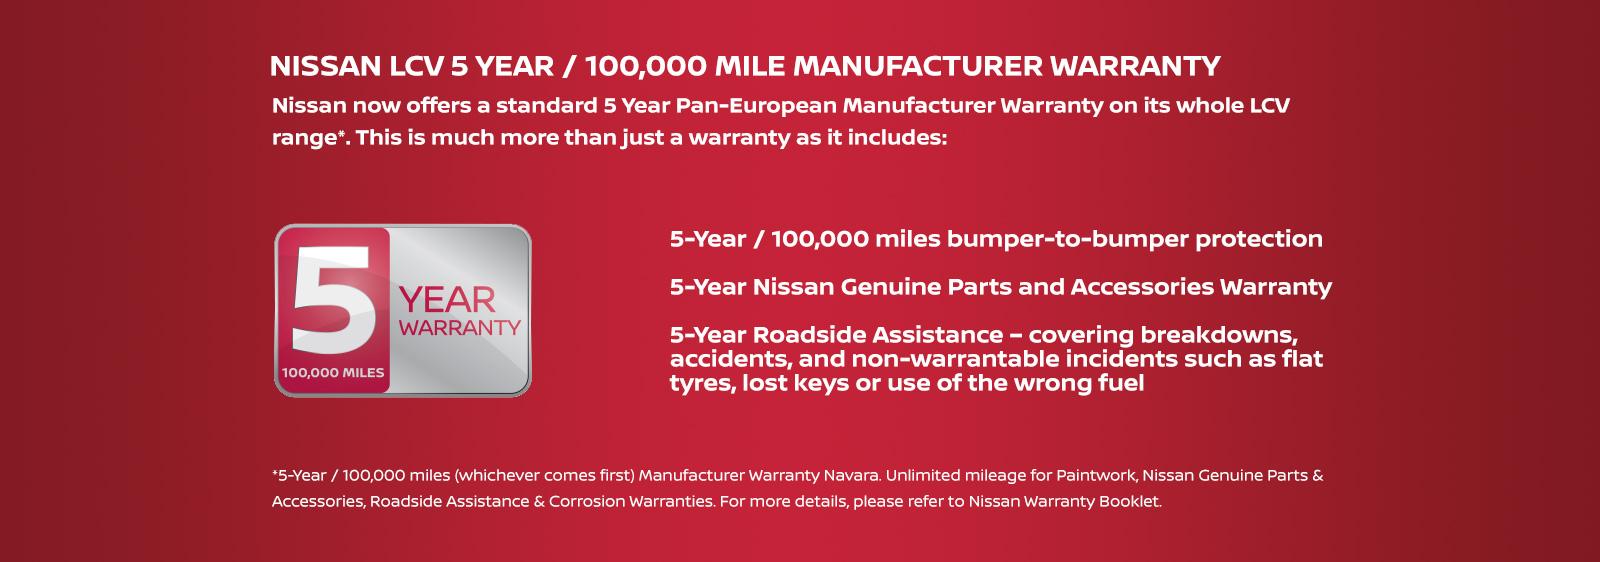 Nissan 5 Year Warranty